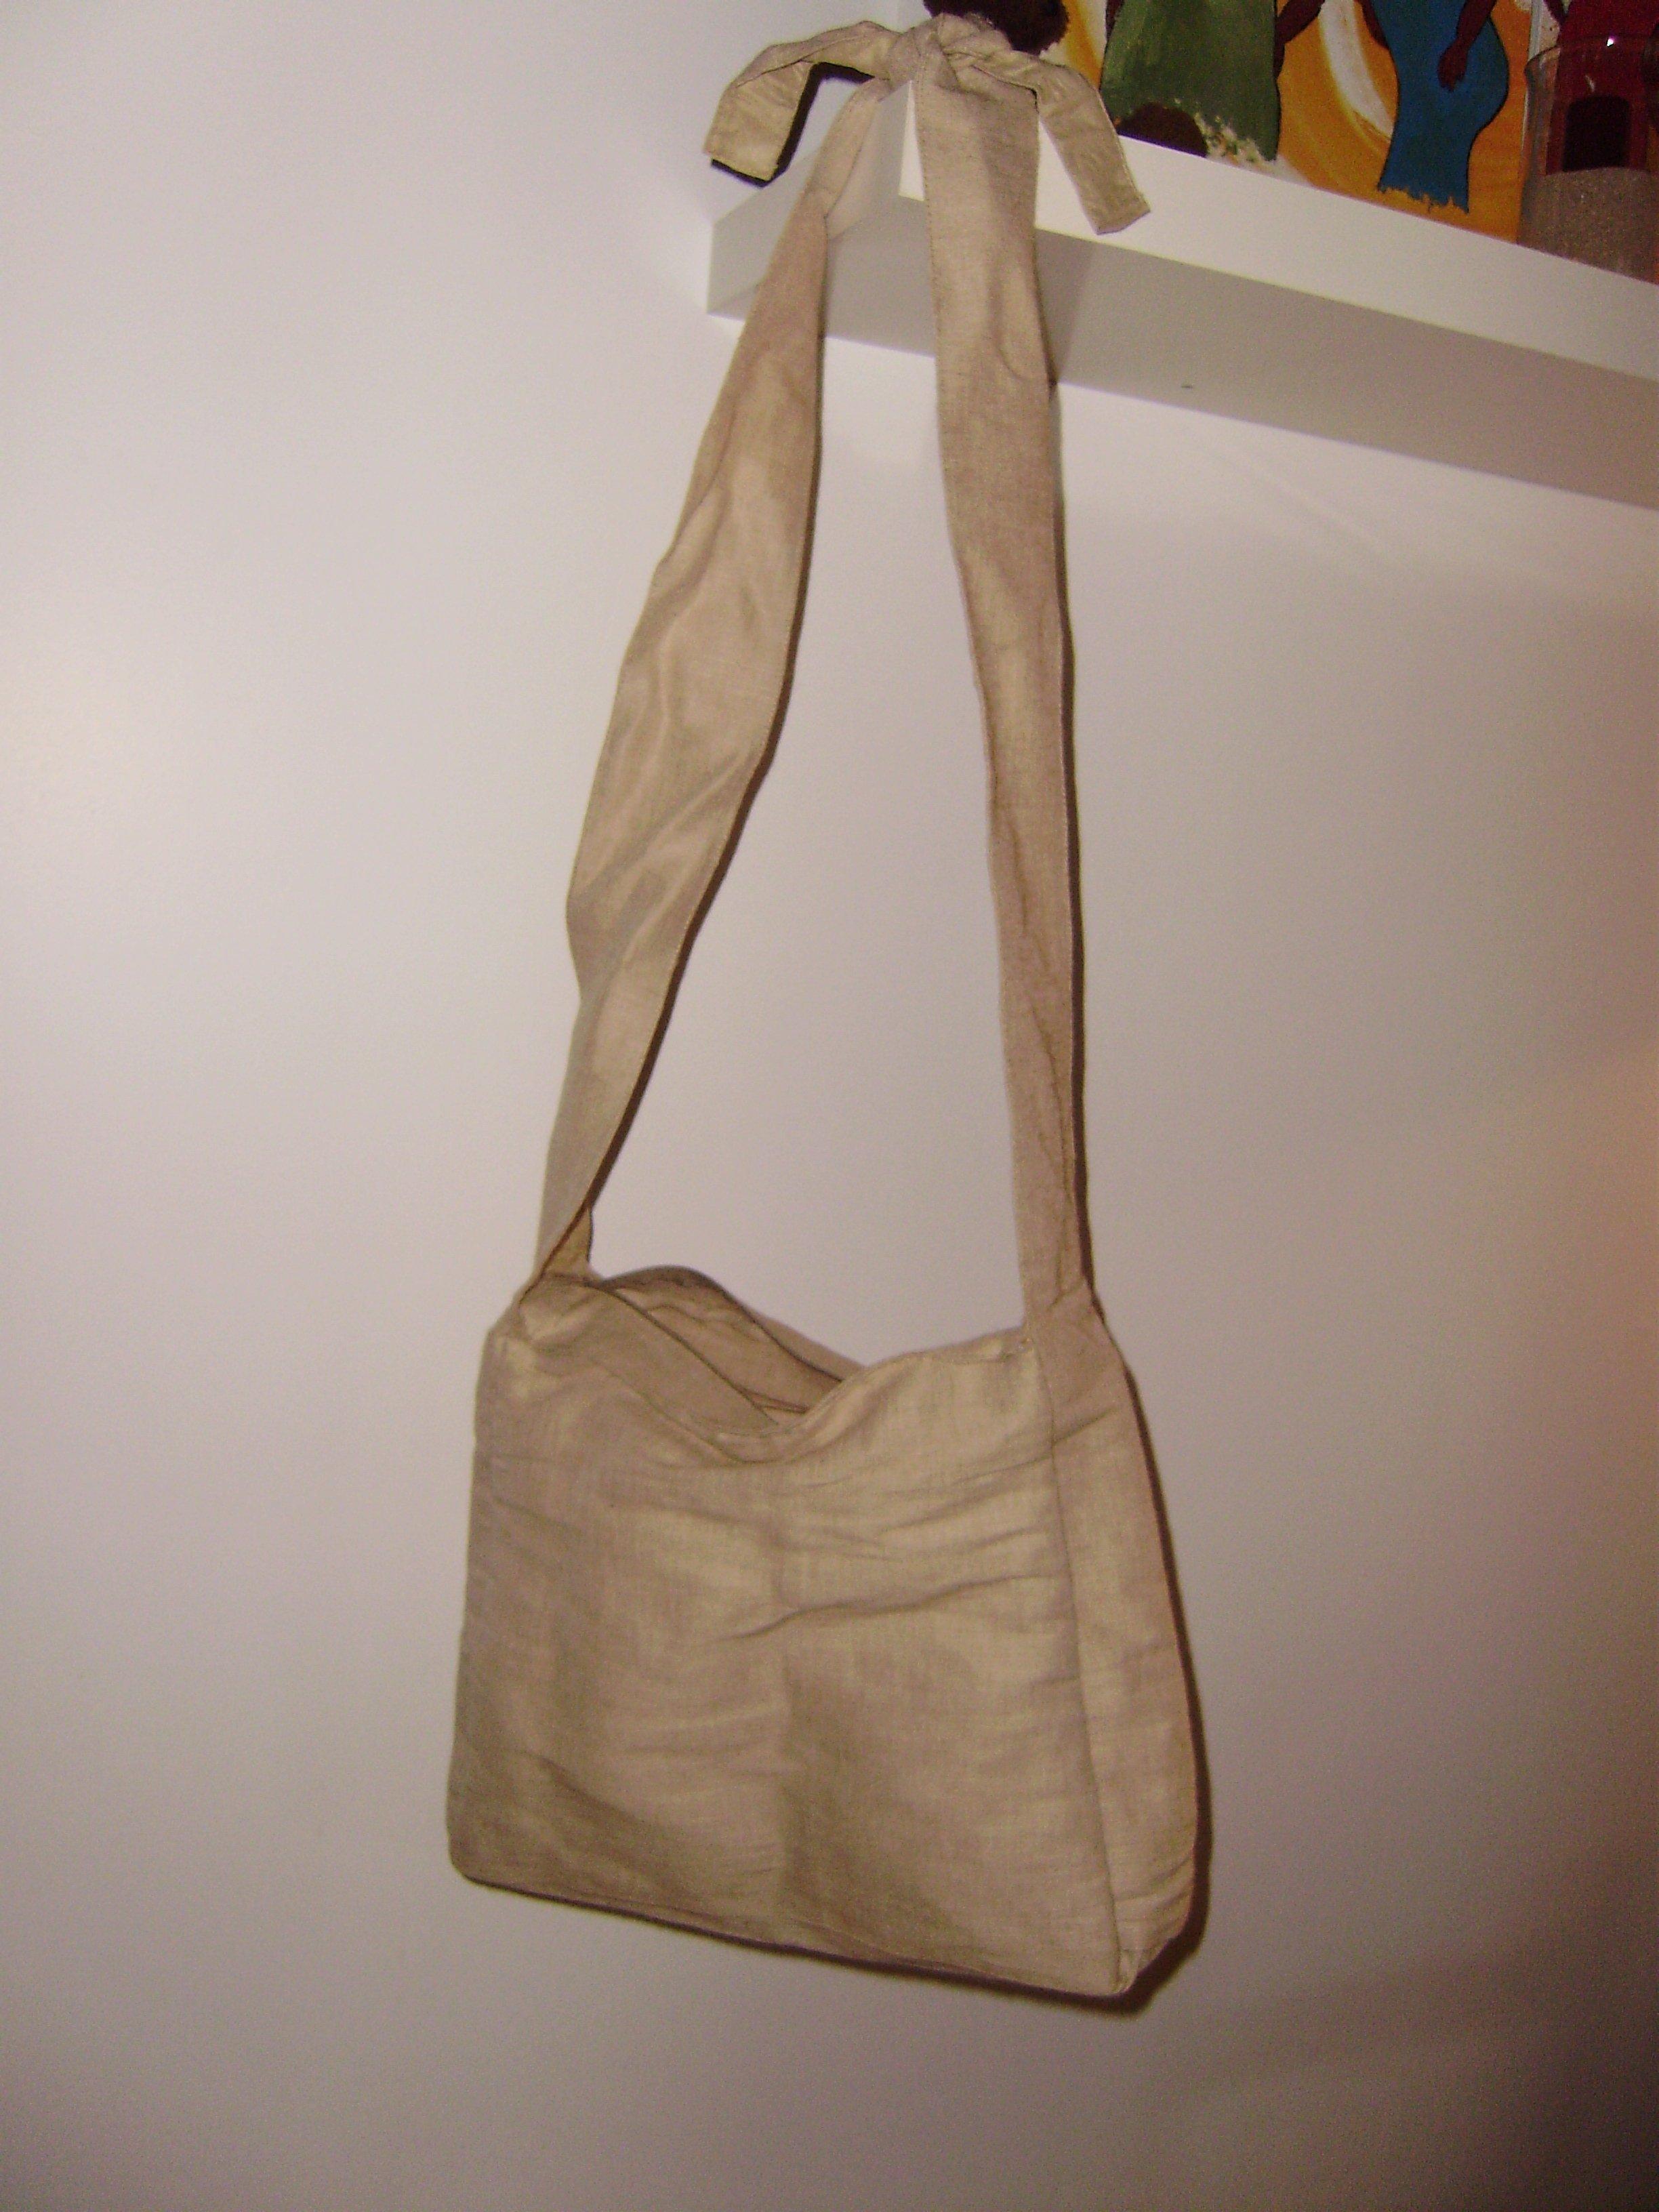 histoire de cr er customisation d un sac. Black Bedroom Furniture Sets. Home Design Ideas